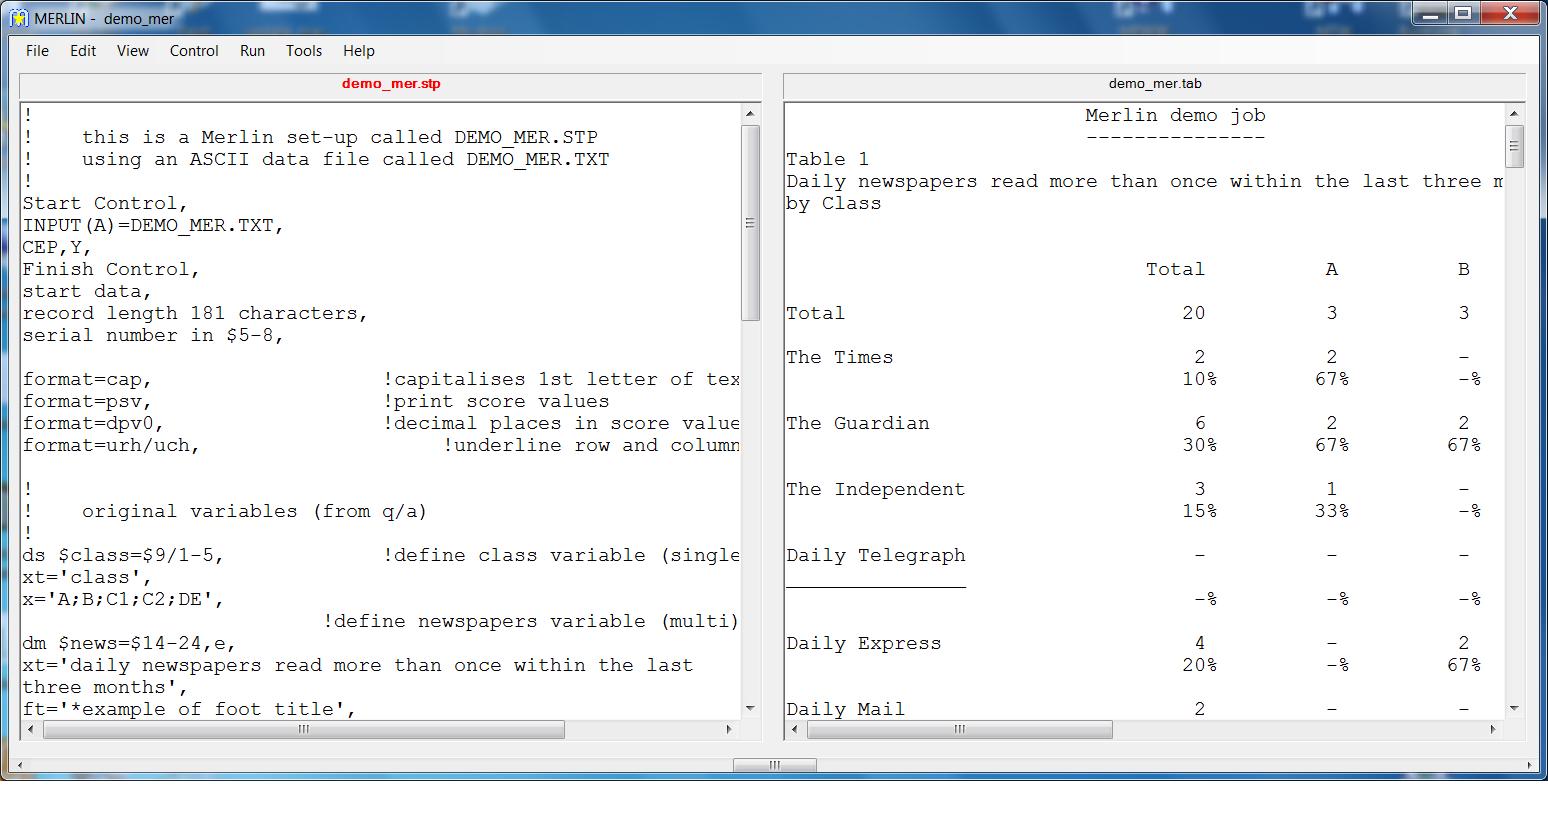 Merlin Screenshot